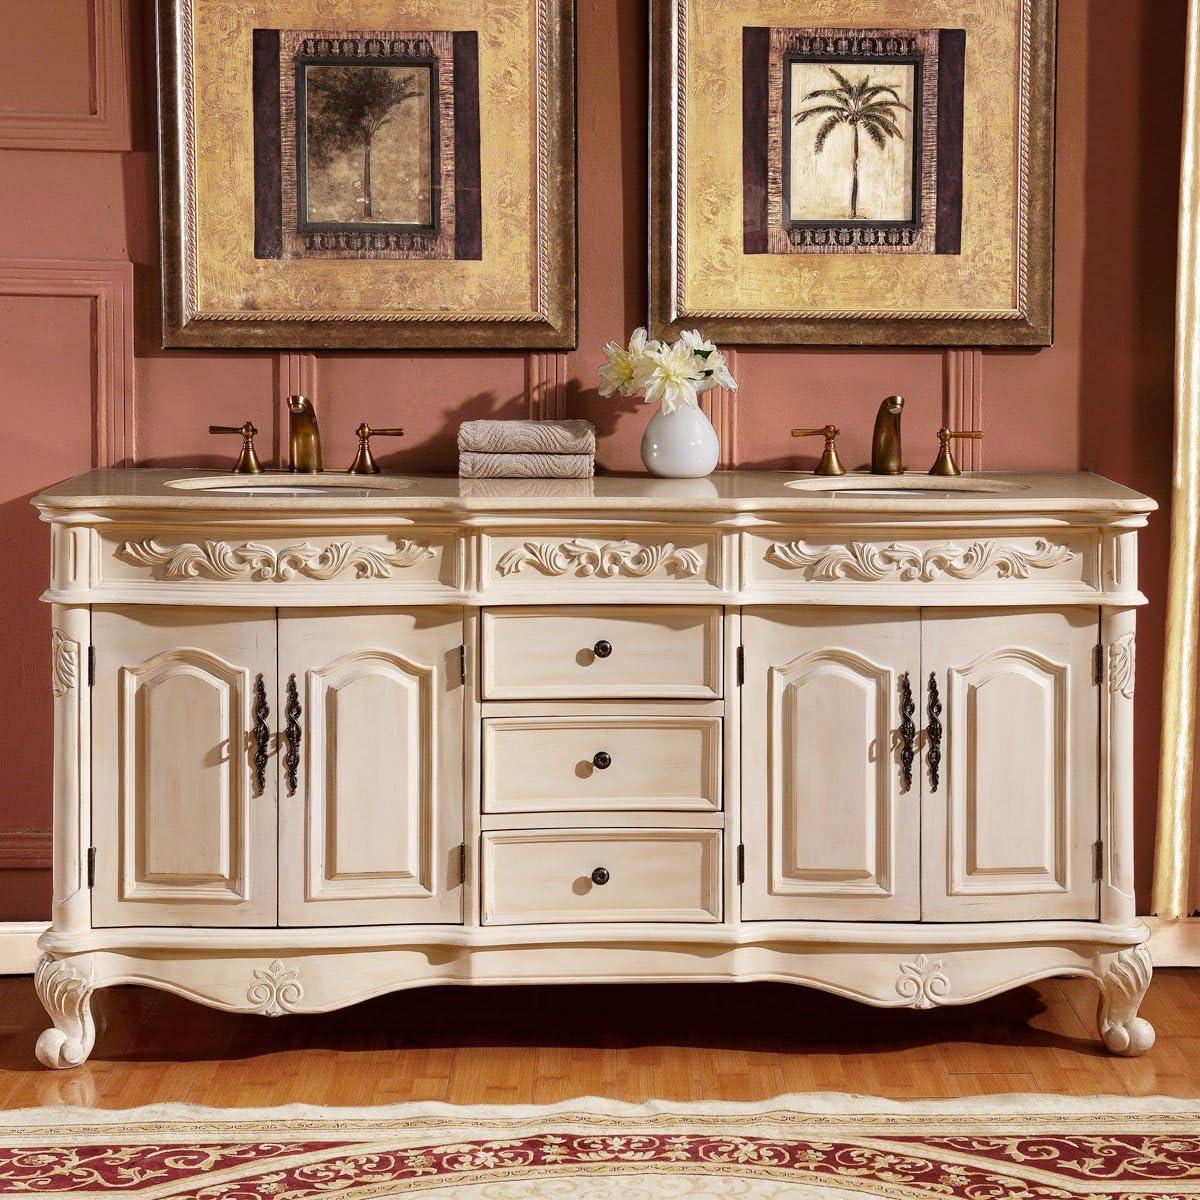 Buy Silkroad Exclusive Countertop Marble Stone Double Sink Bathroom Vanity With Cabinet 72 Cream Online In Kazakhstan B00w0yz2fw